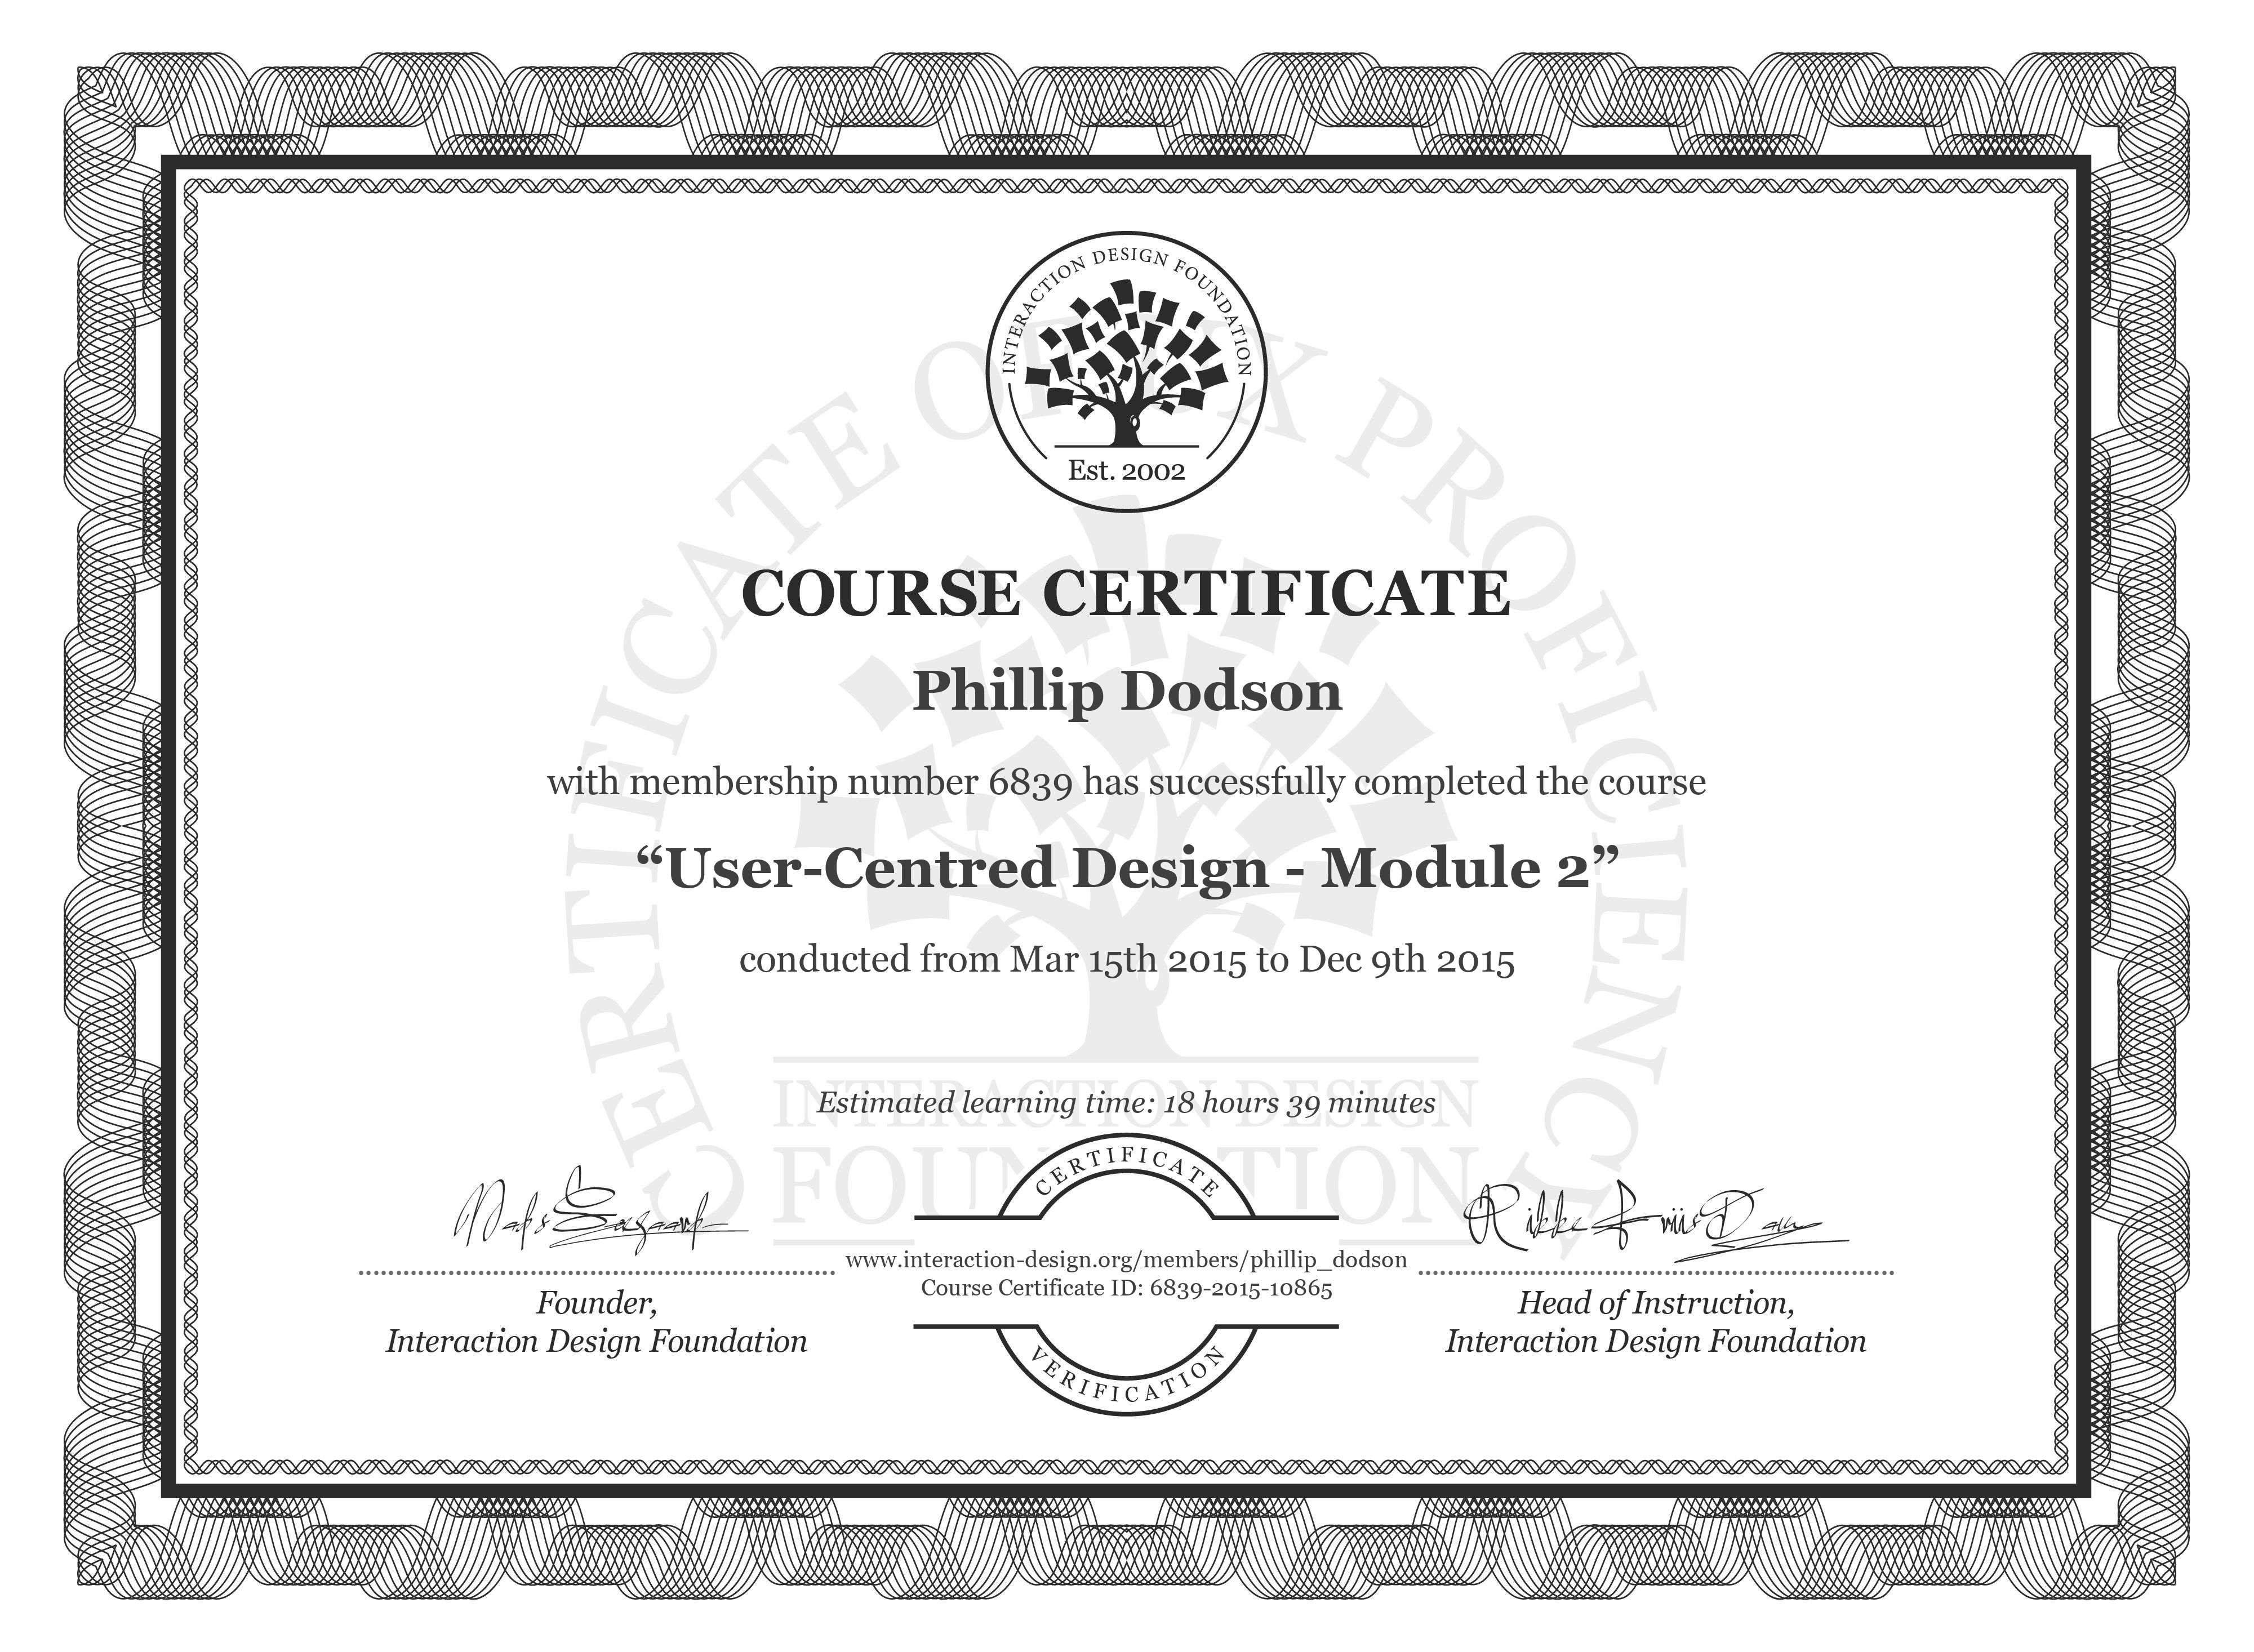 Phillip Dodson's Course Certificate: User-Centred Design - Module 2